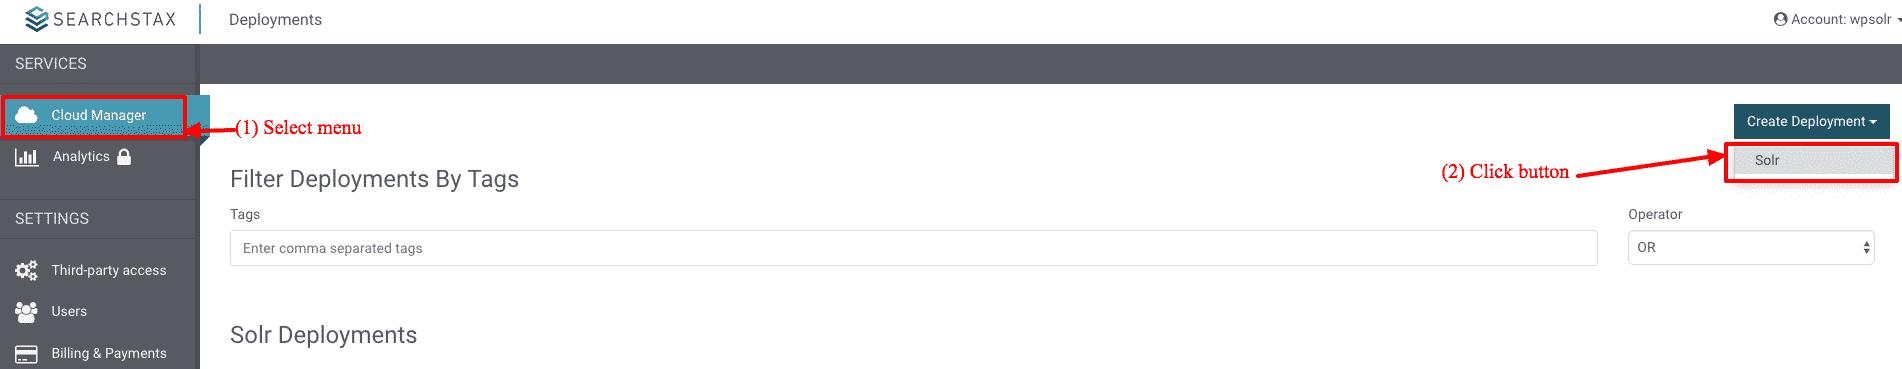 SearchStax: new deployment